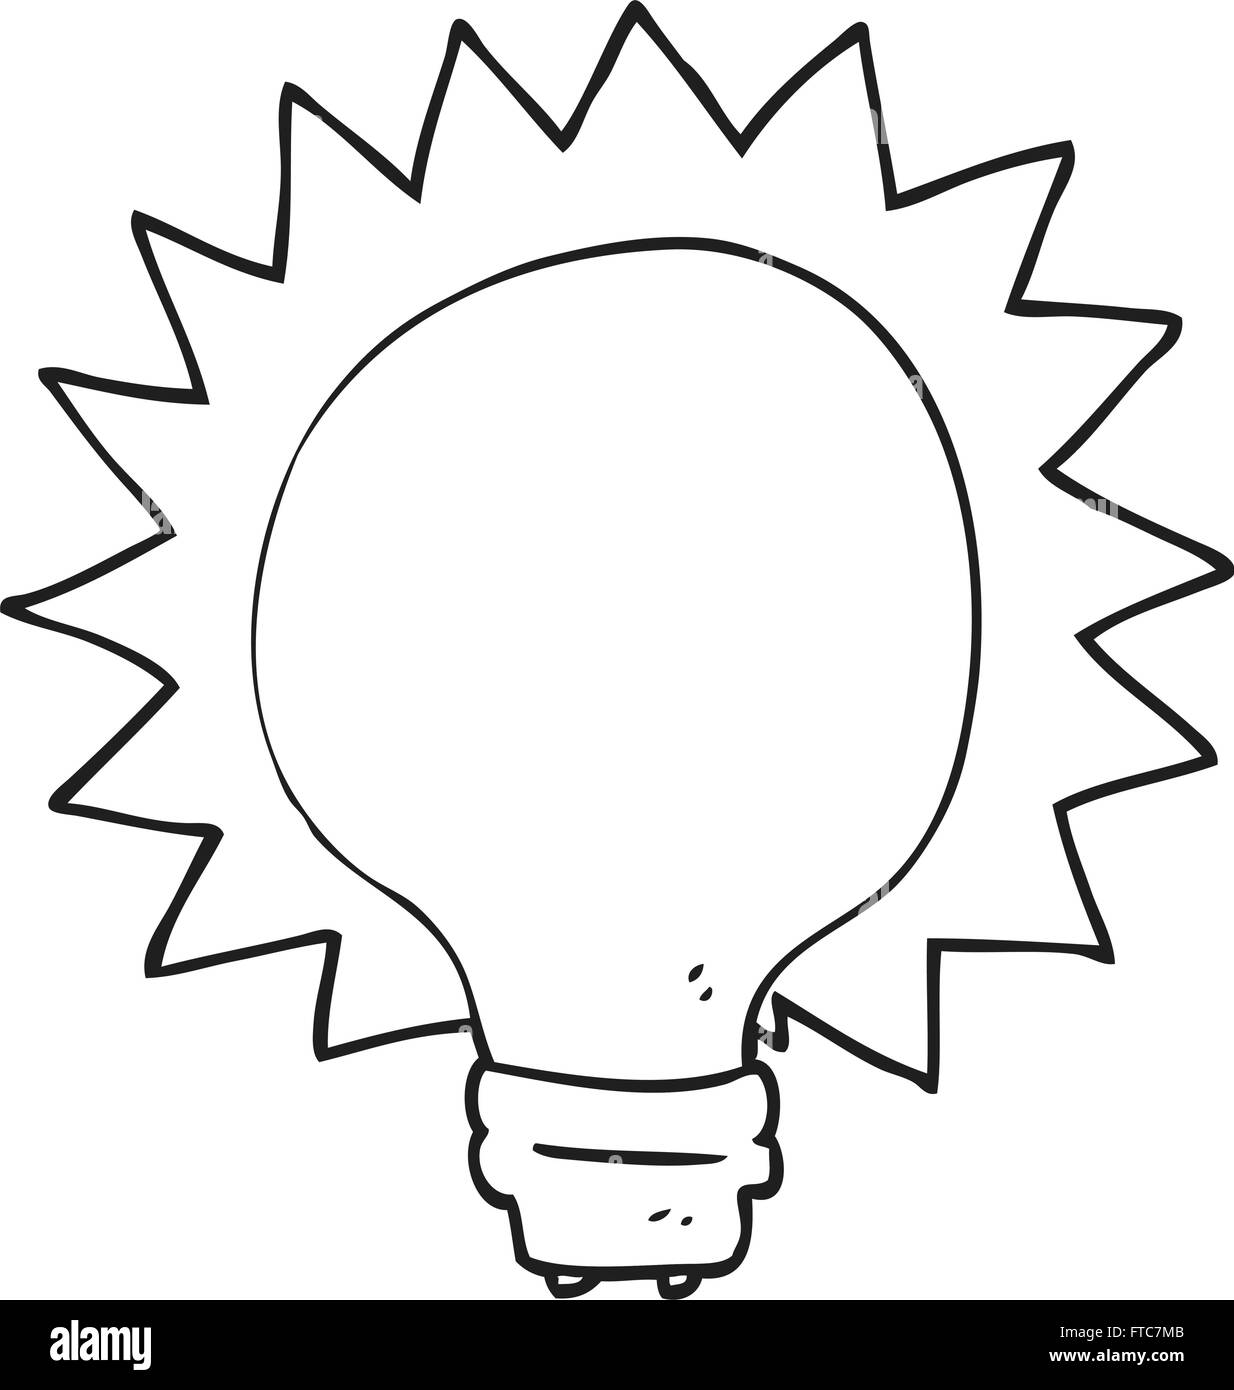 Freehand Drawn Black And White Cartoon Light Bulb Stock Vector Art